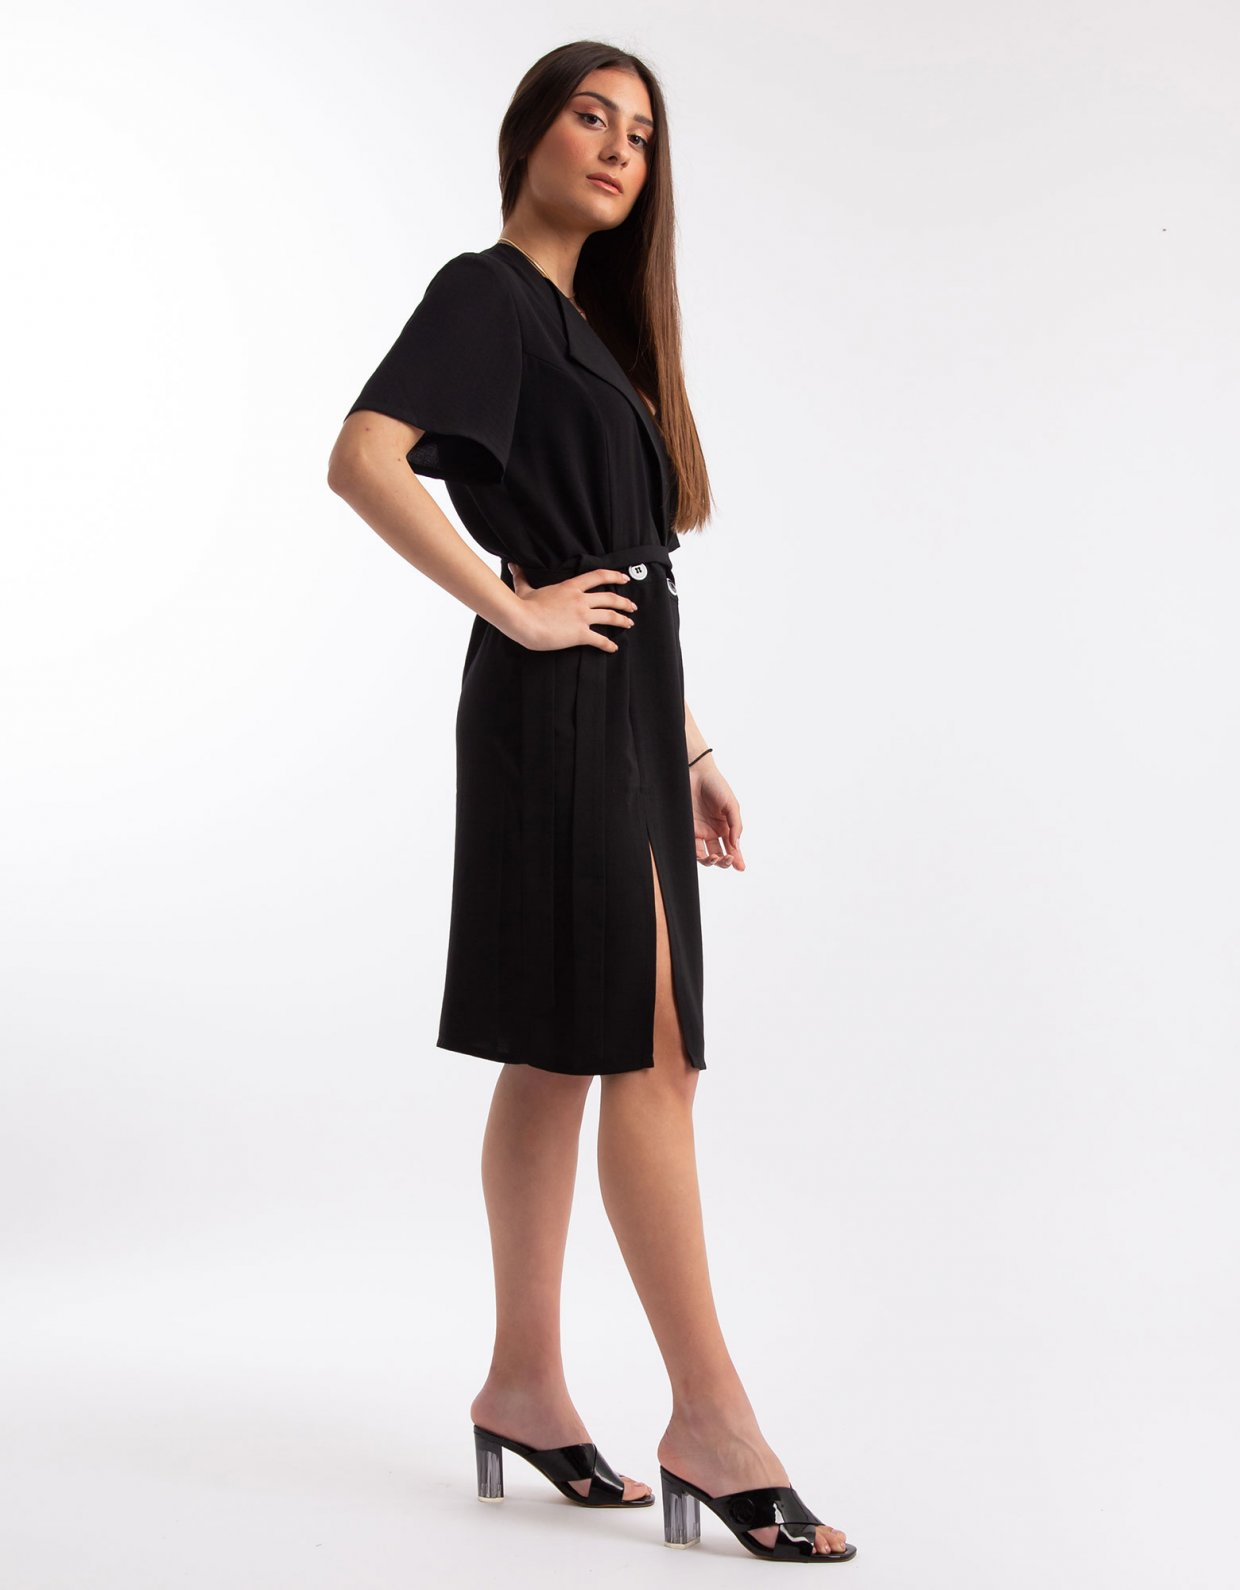 Nadia Rapti Shades of Sahara black suit/dress